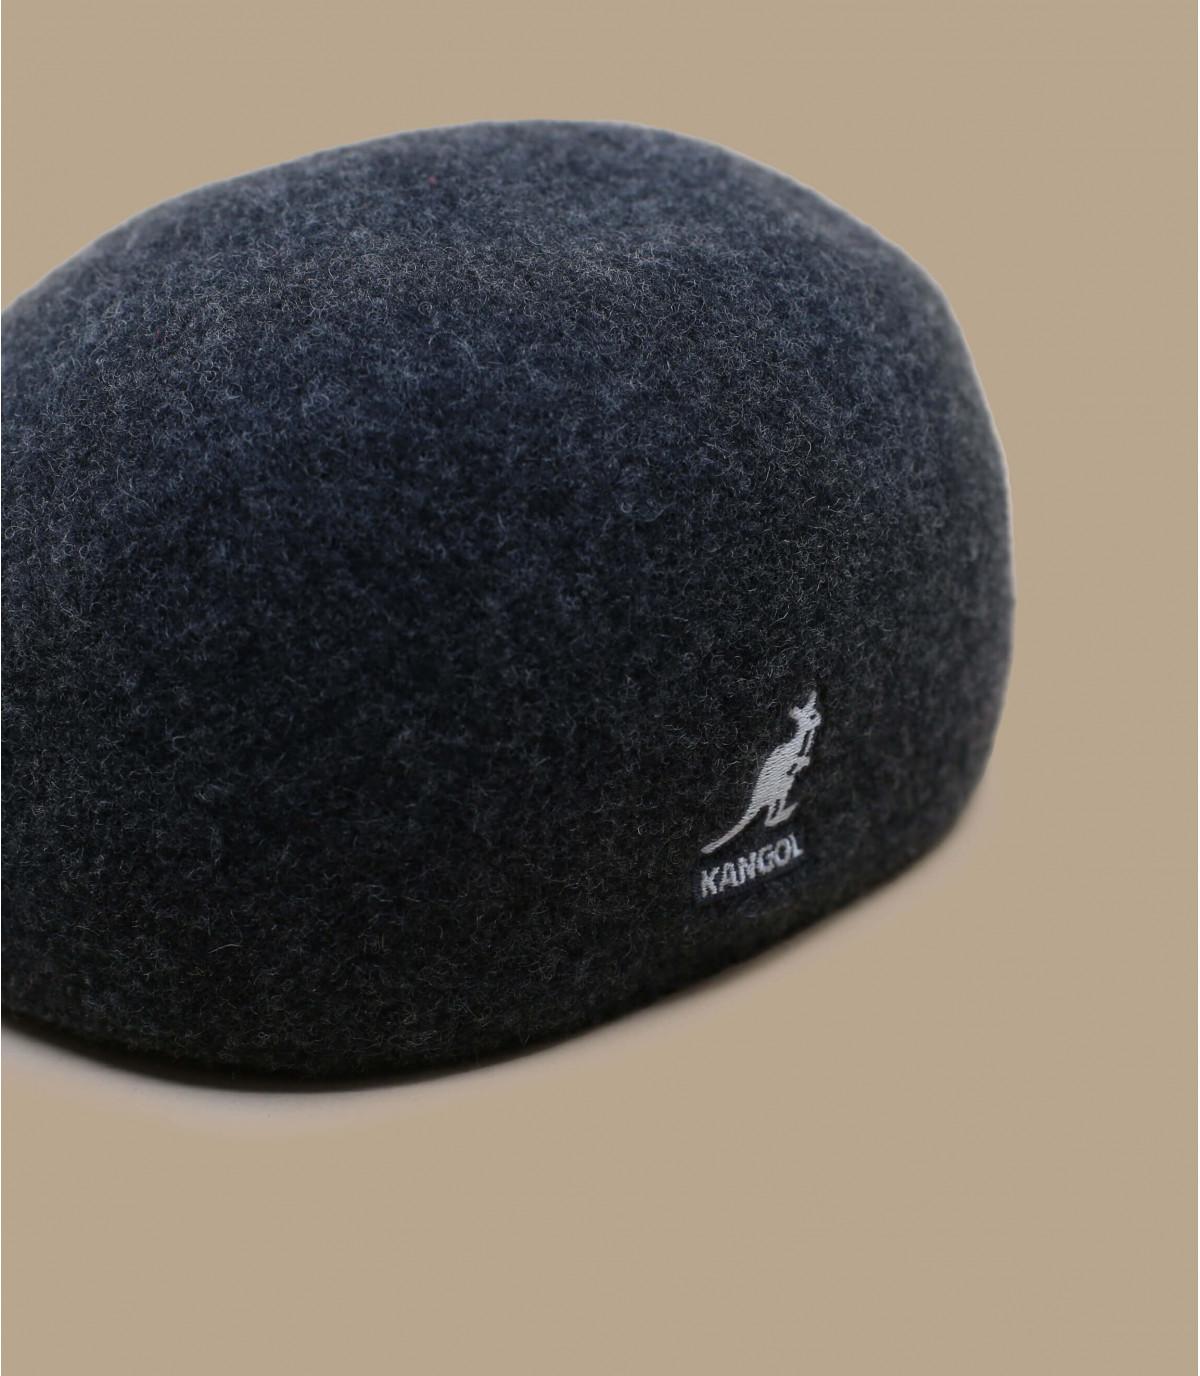 Détails Seamless Wool 507 dk flannel - image 2